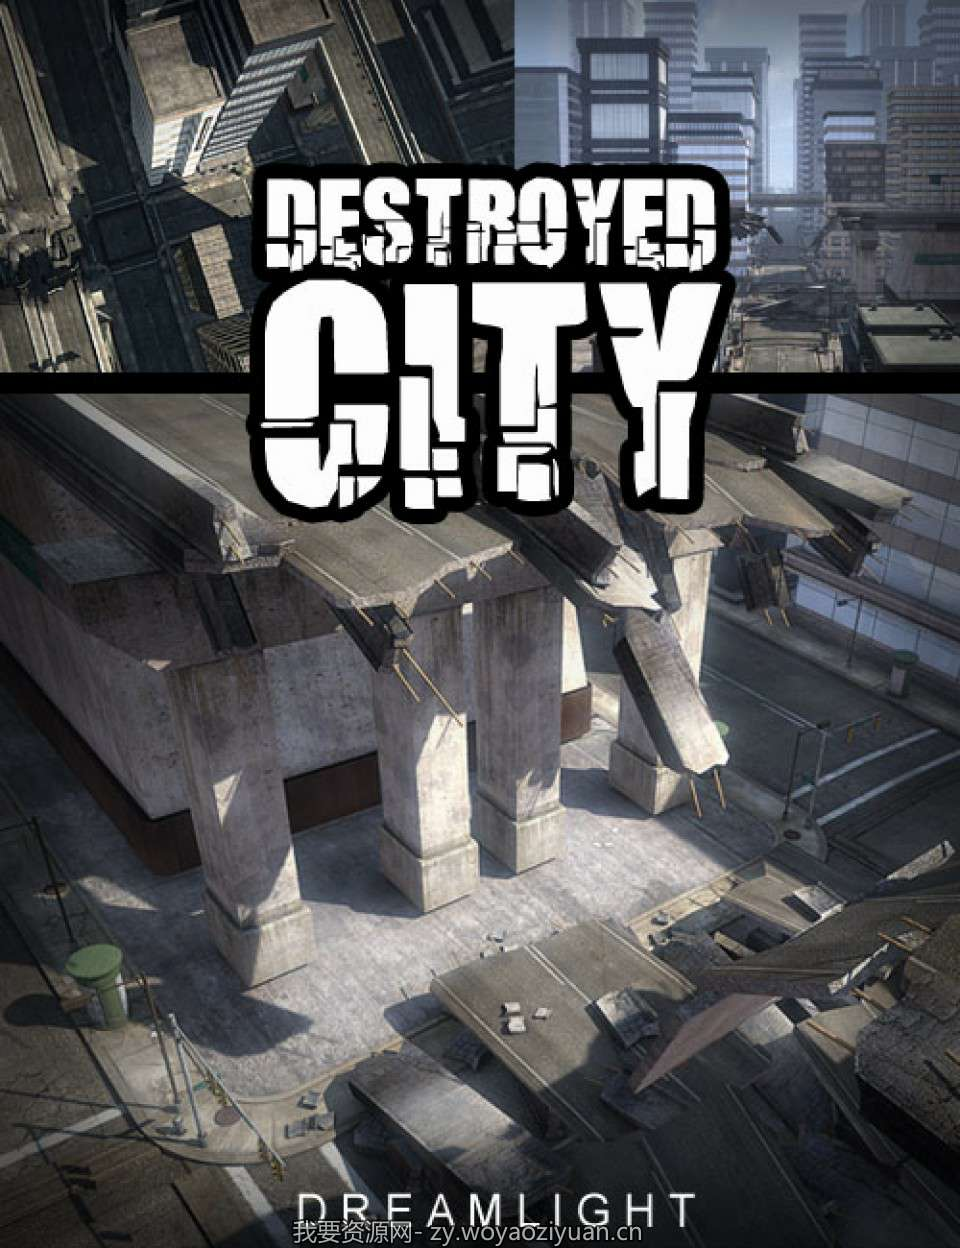 In The City_Destroyed Bridge